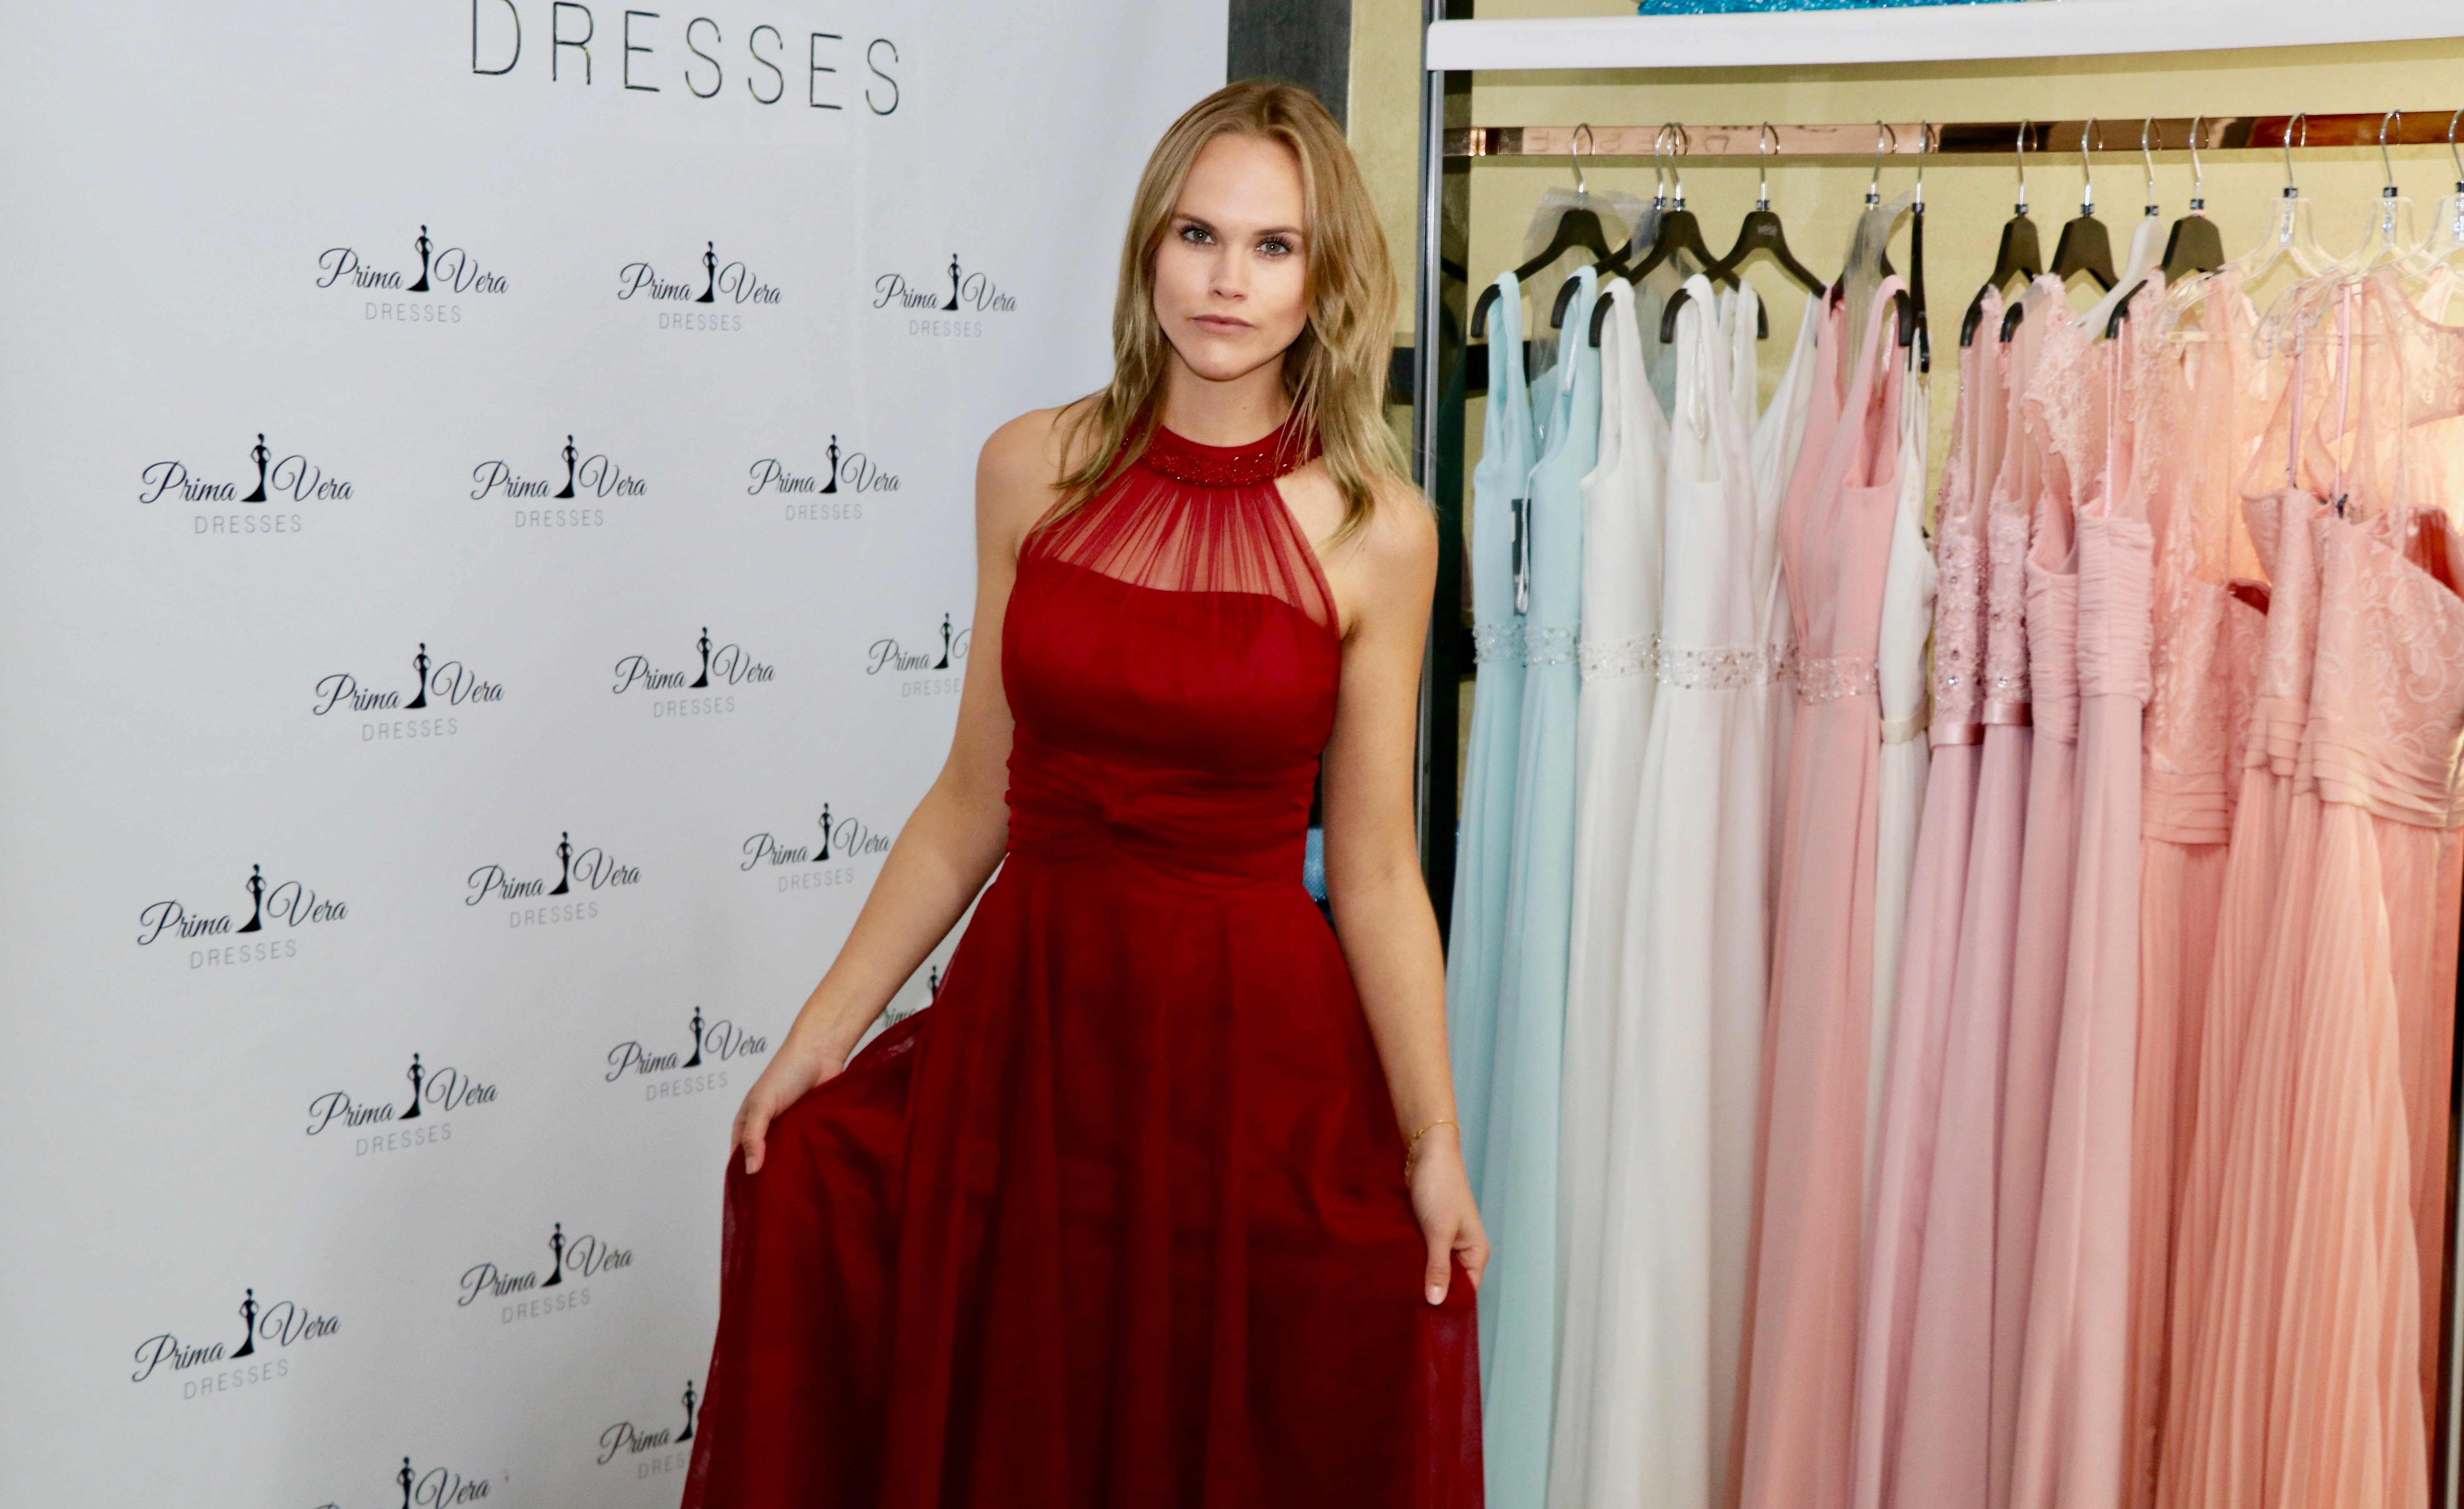 PrimaVera Dresses